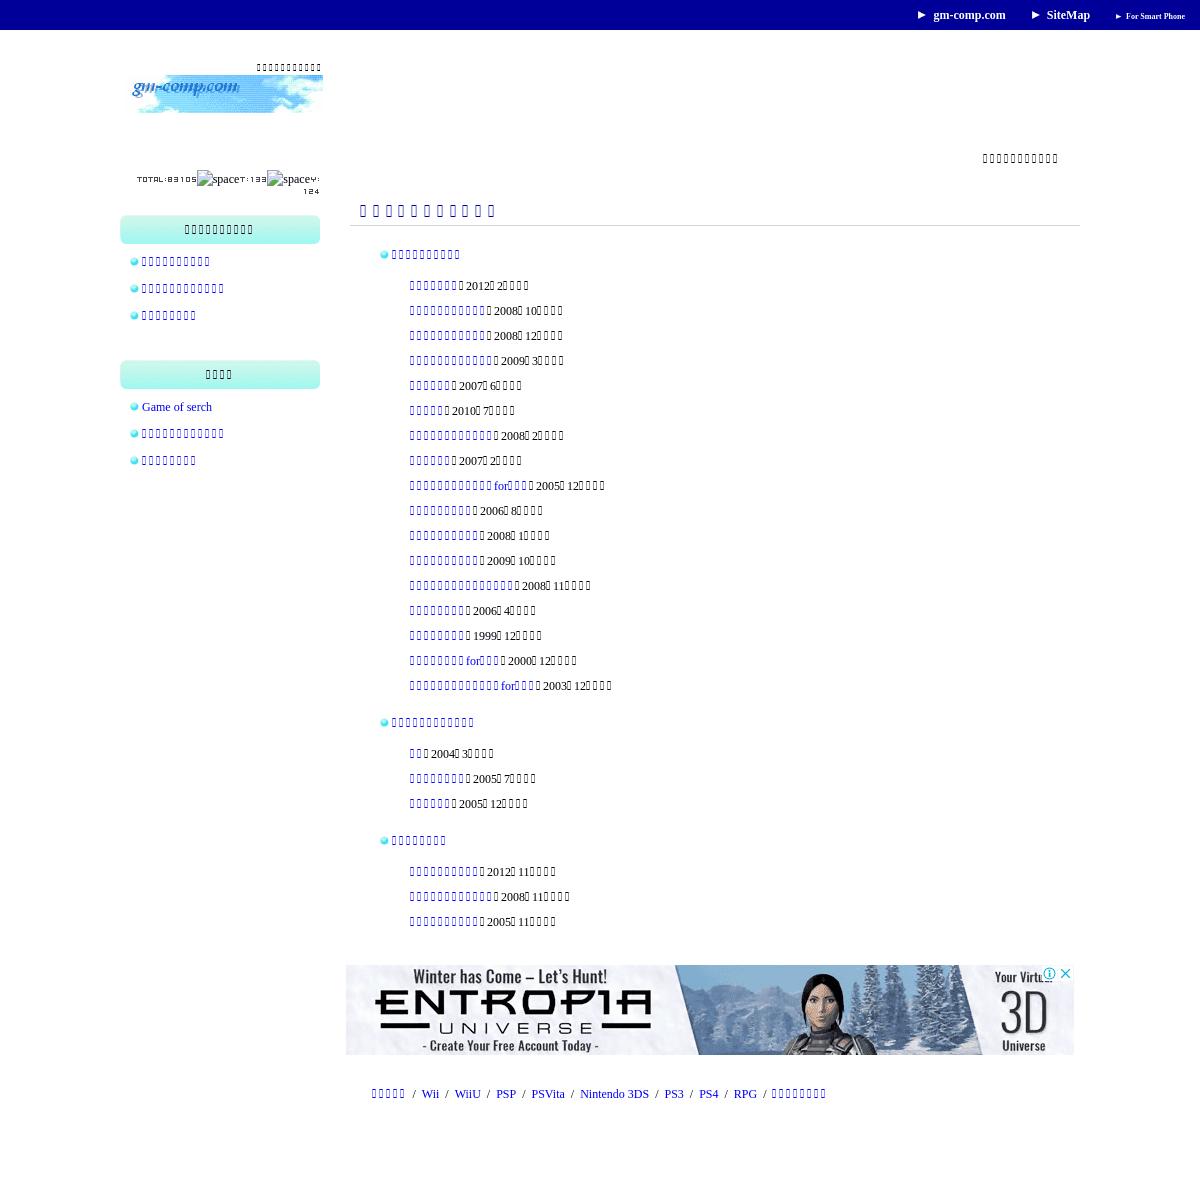 gm-comp-ゲーム攻略データベース